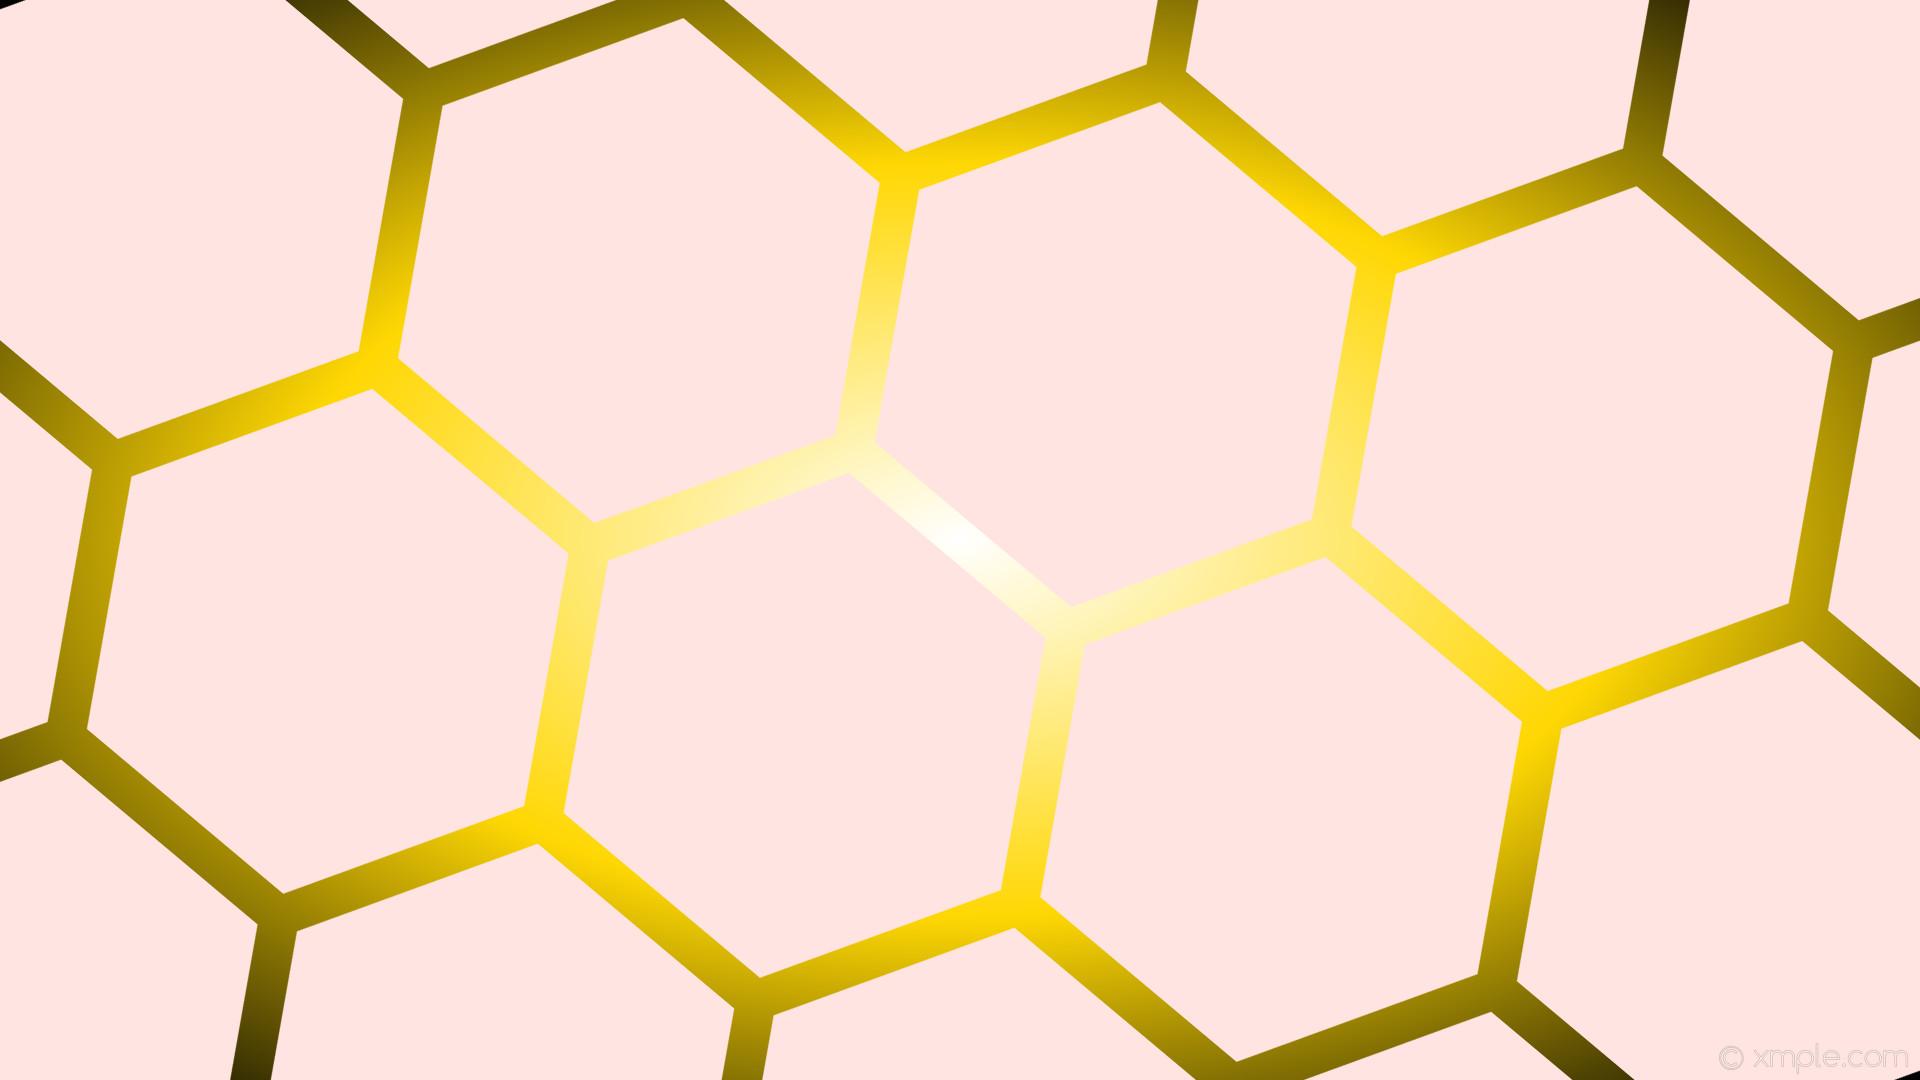 wallpaper black gradient glow white hexagon yellow misty rose gold #ffe4e1  #ffffff #ffd700